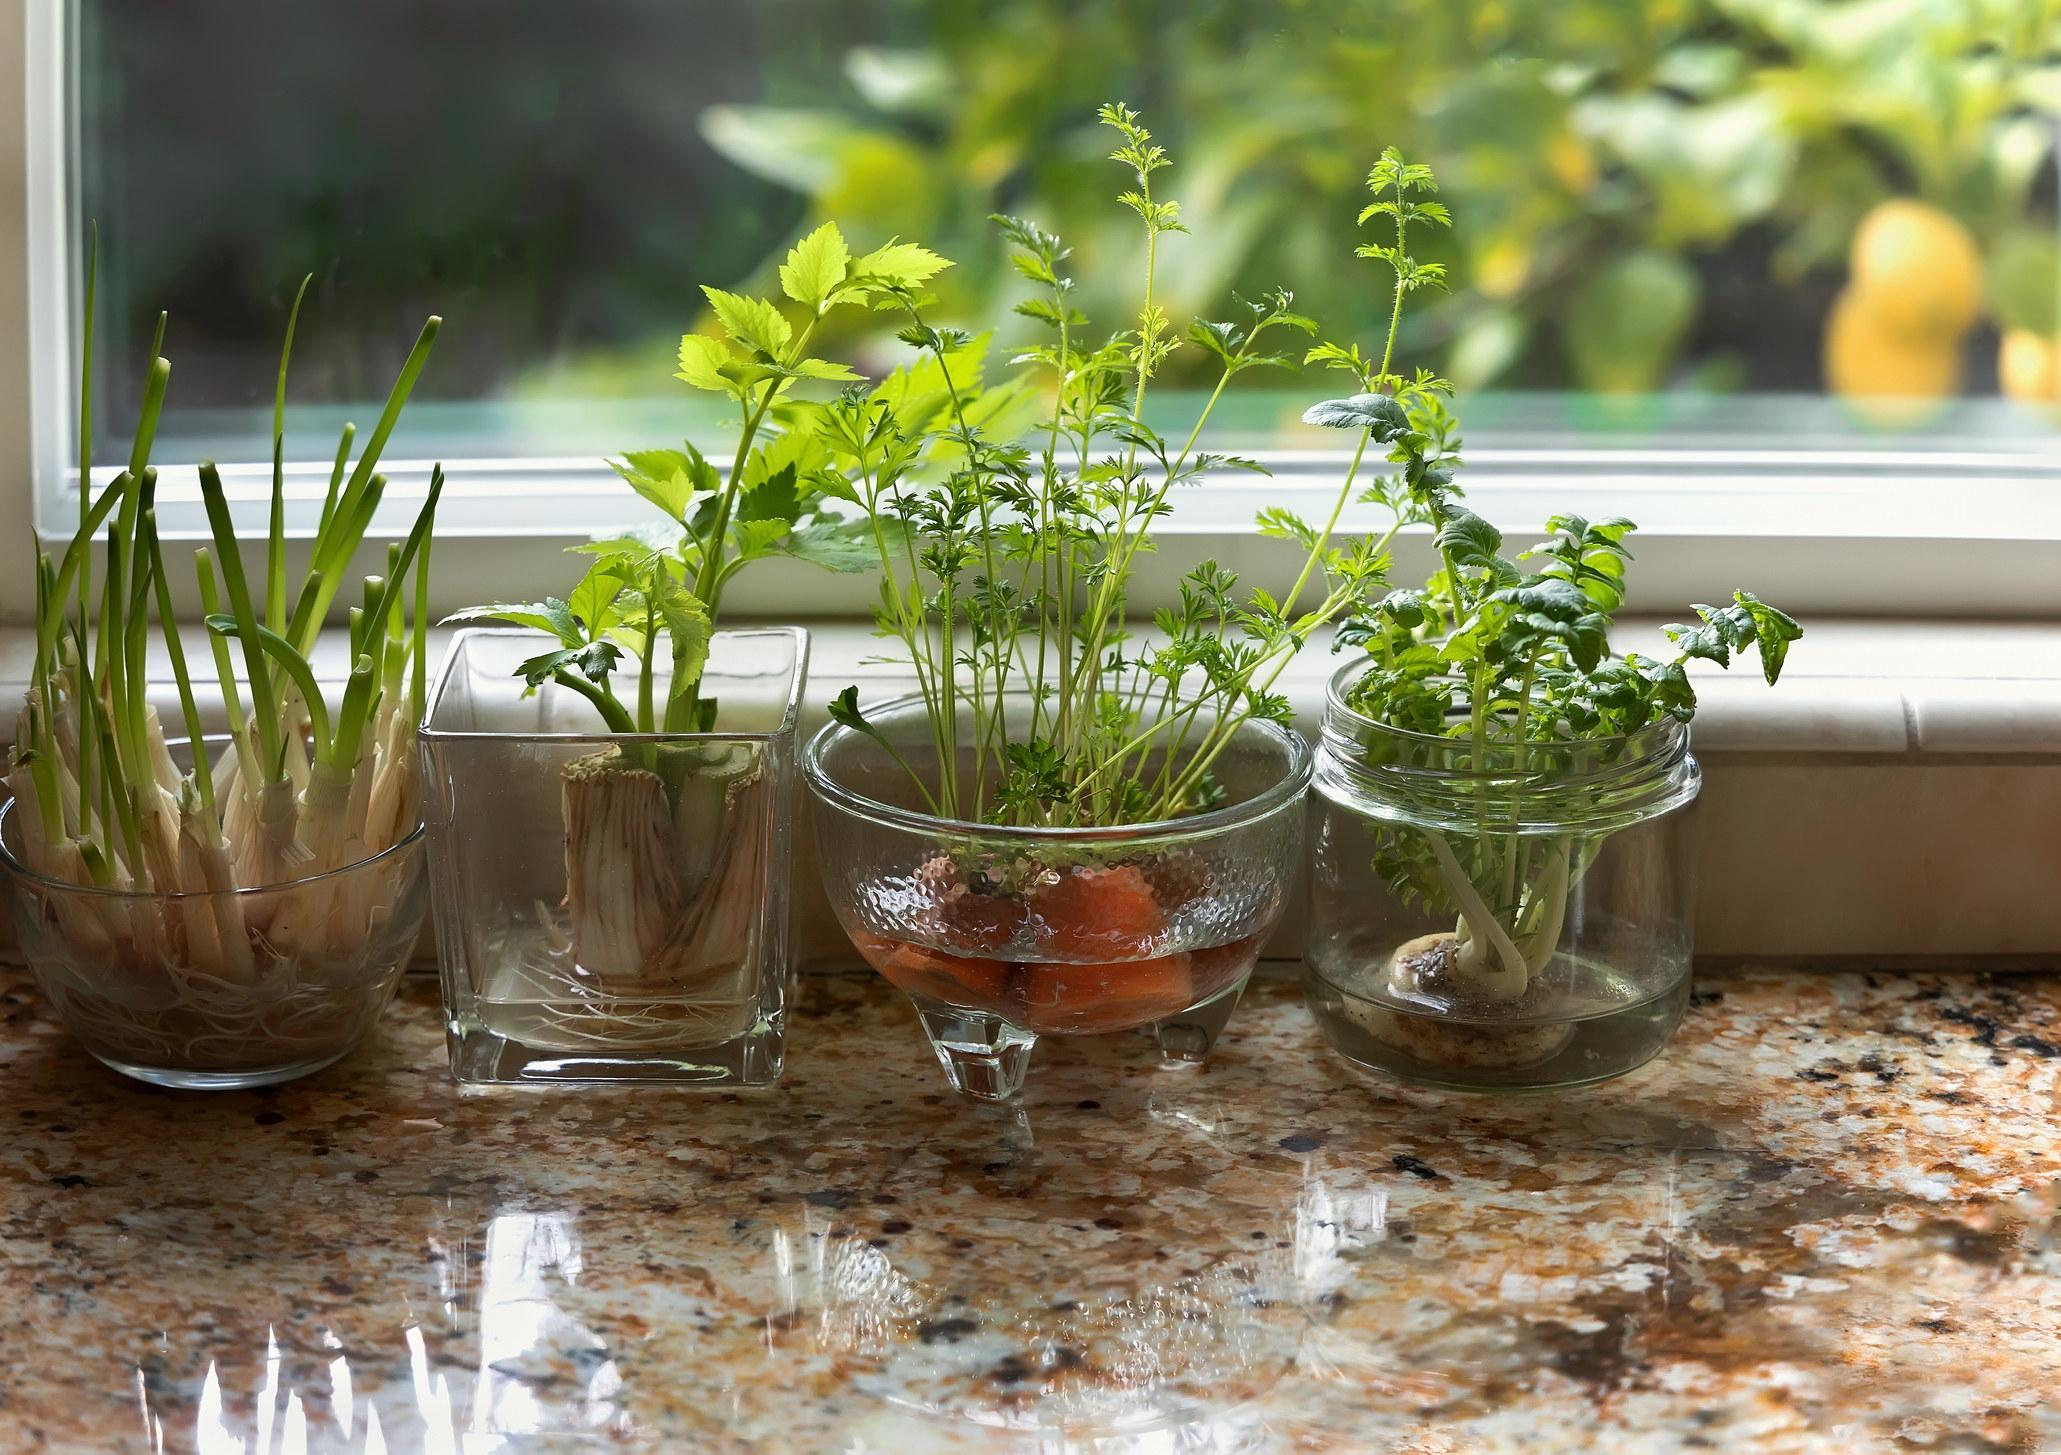 Herbs growing on countertop